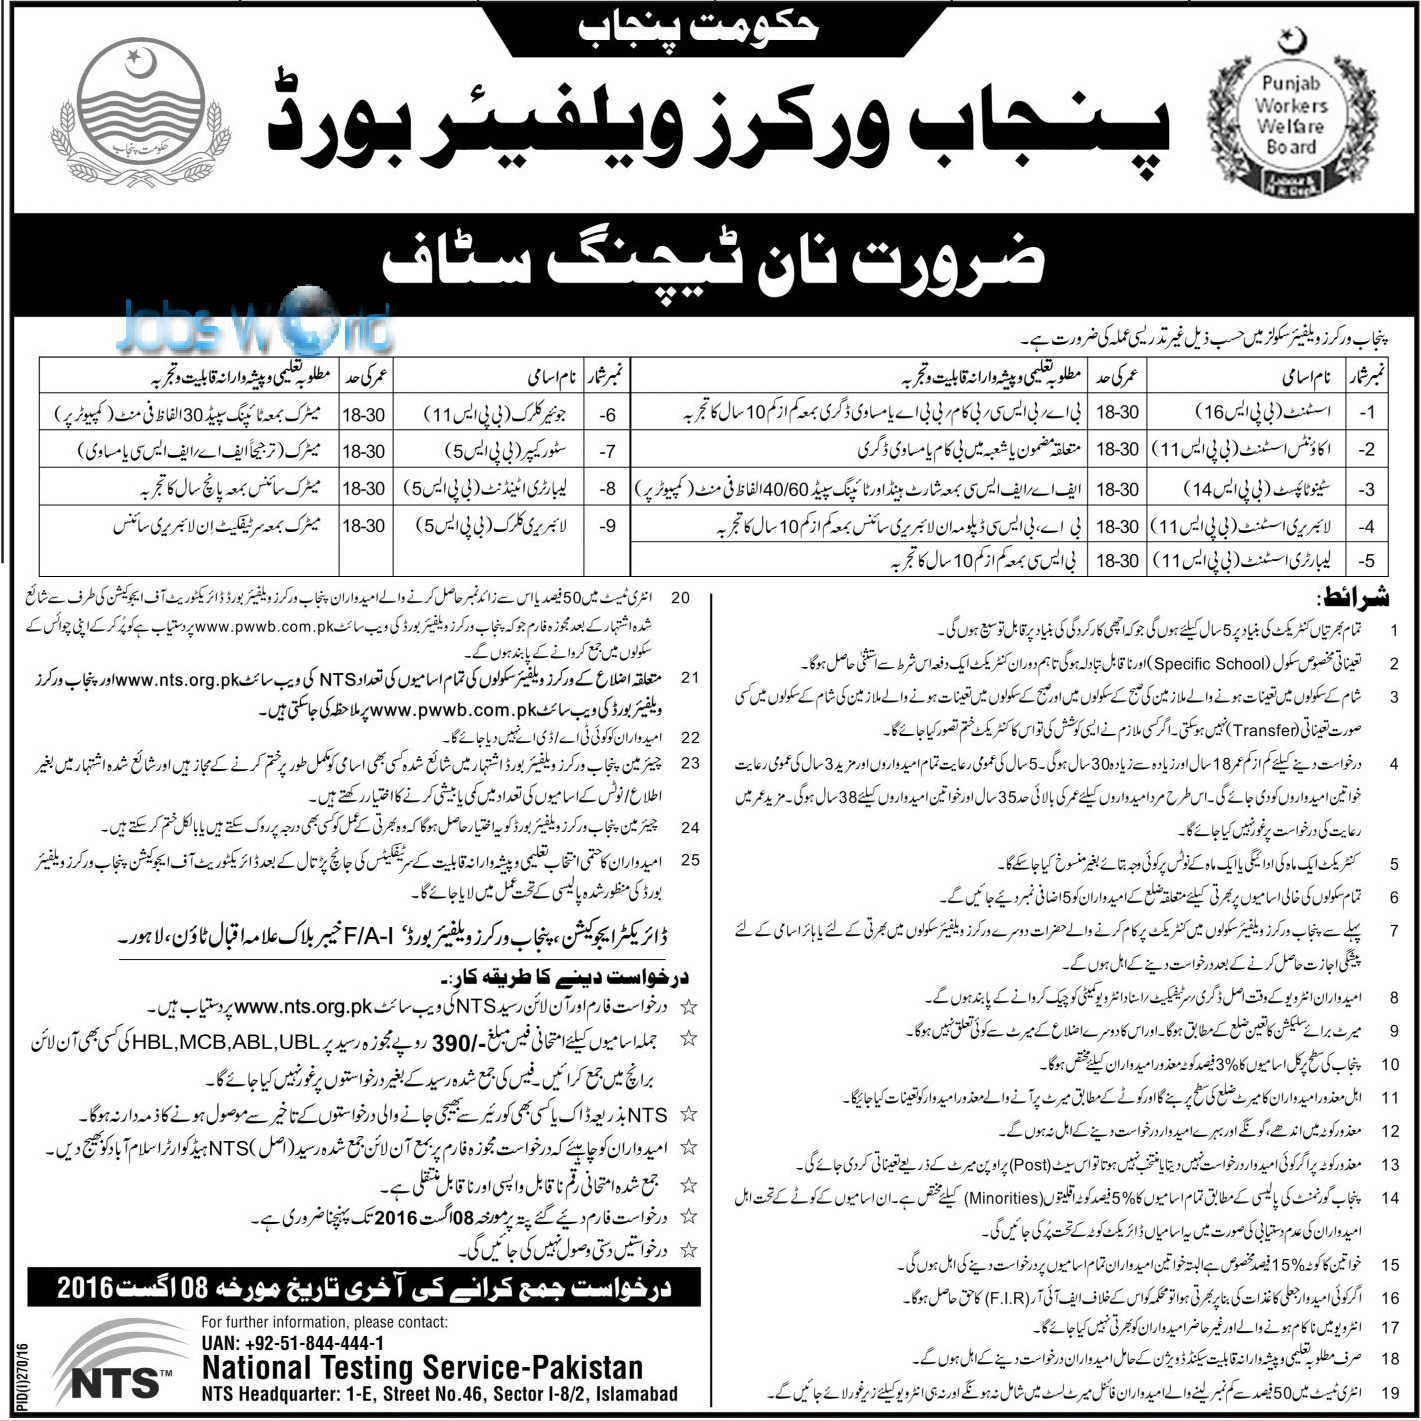 Punjab Workers Welfare Board Job Opportunities 2016 Non